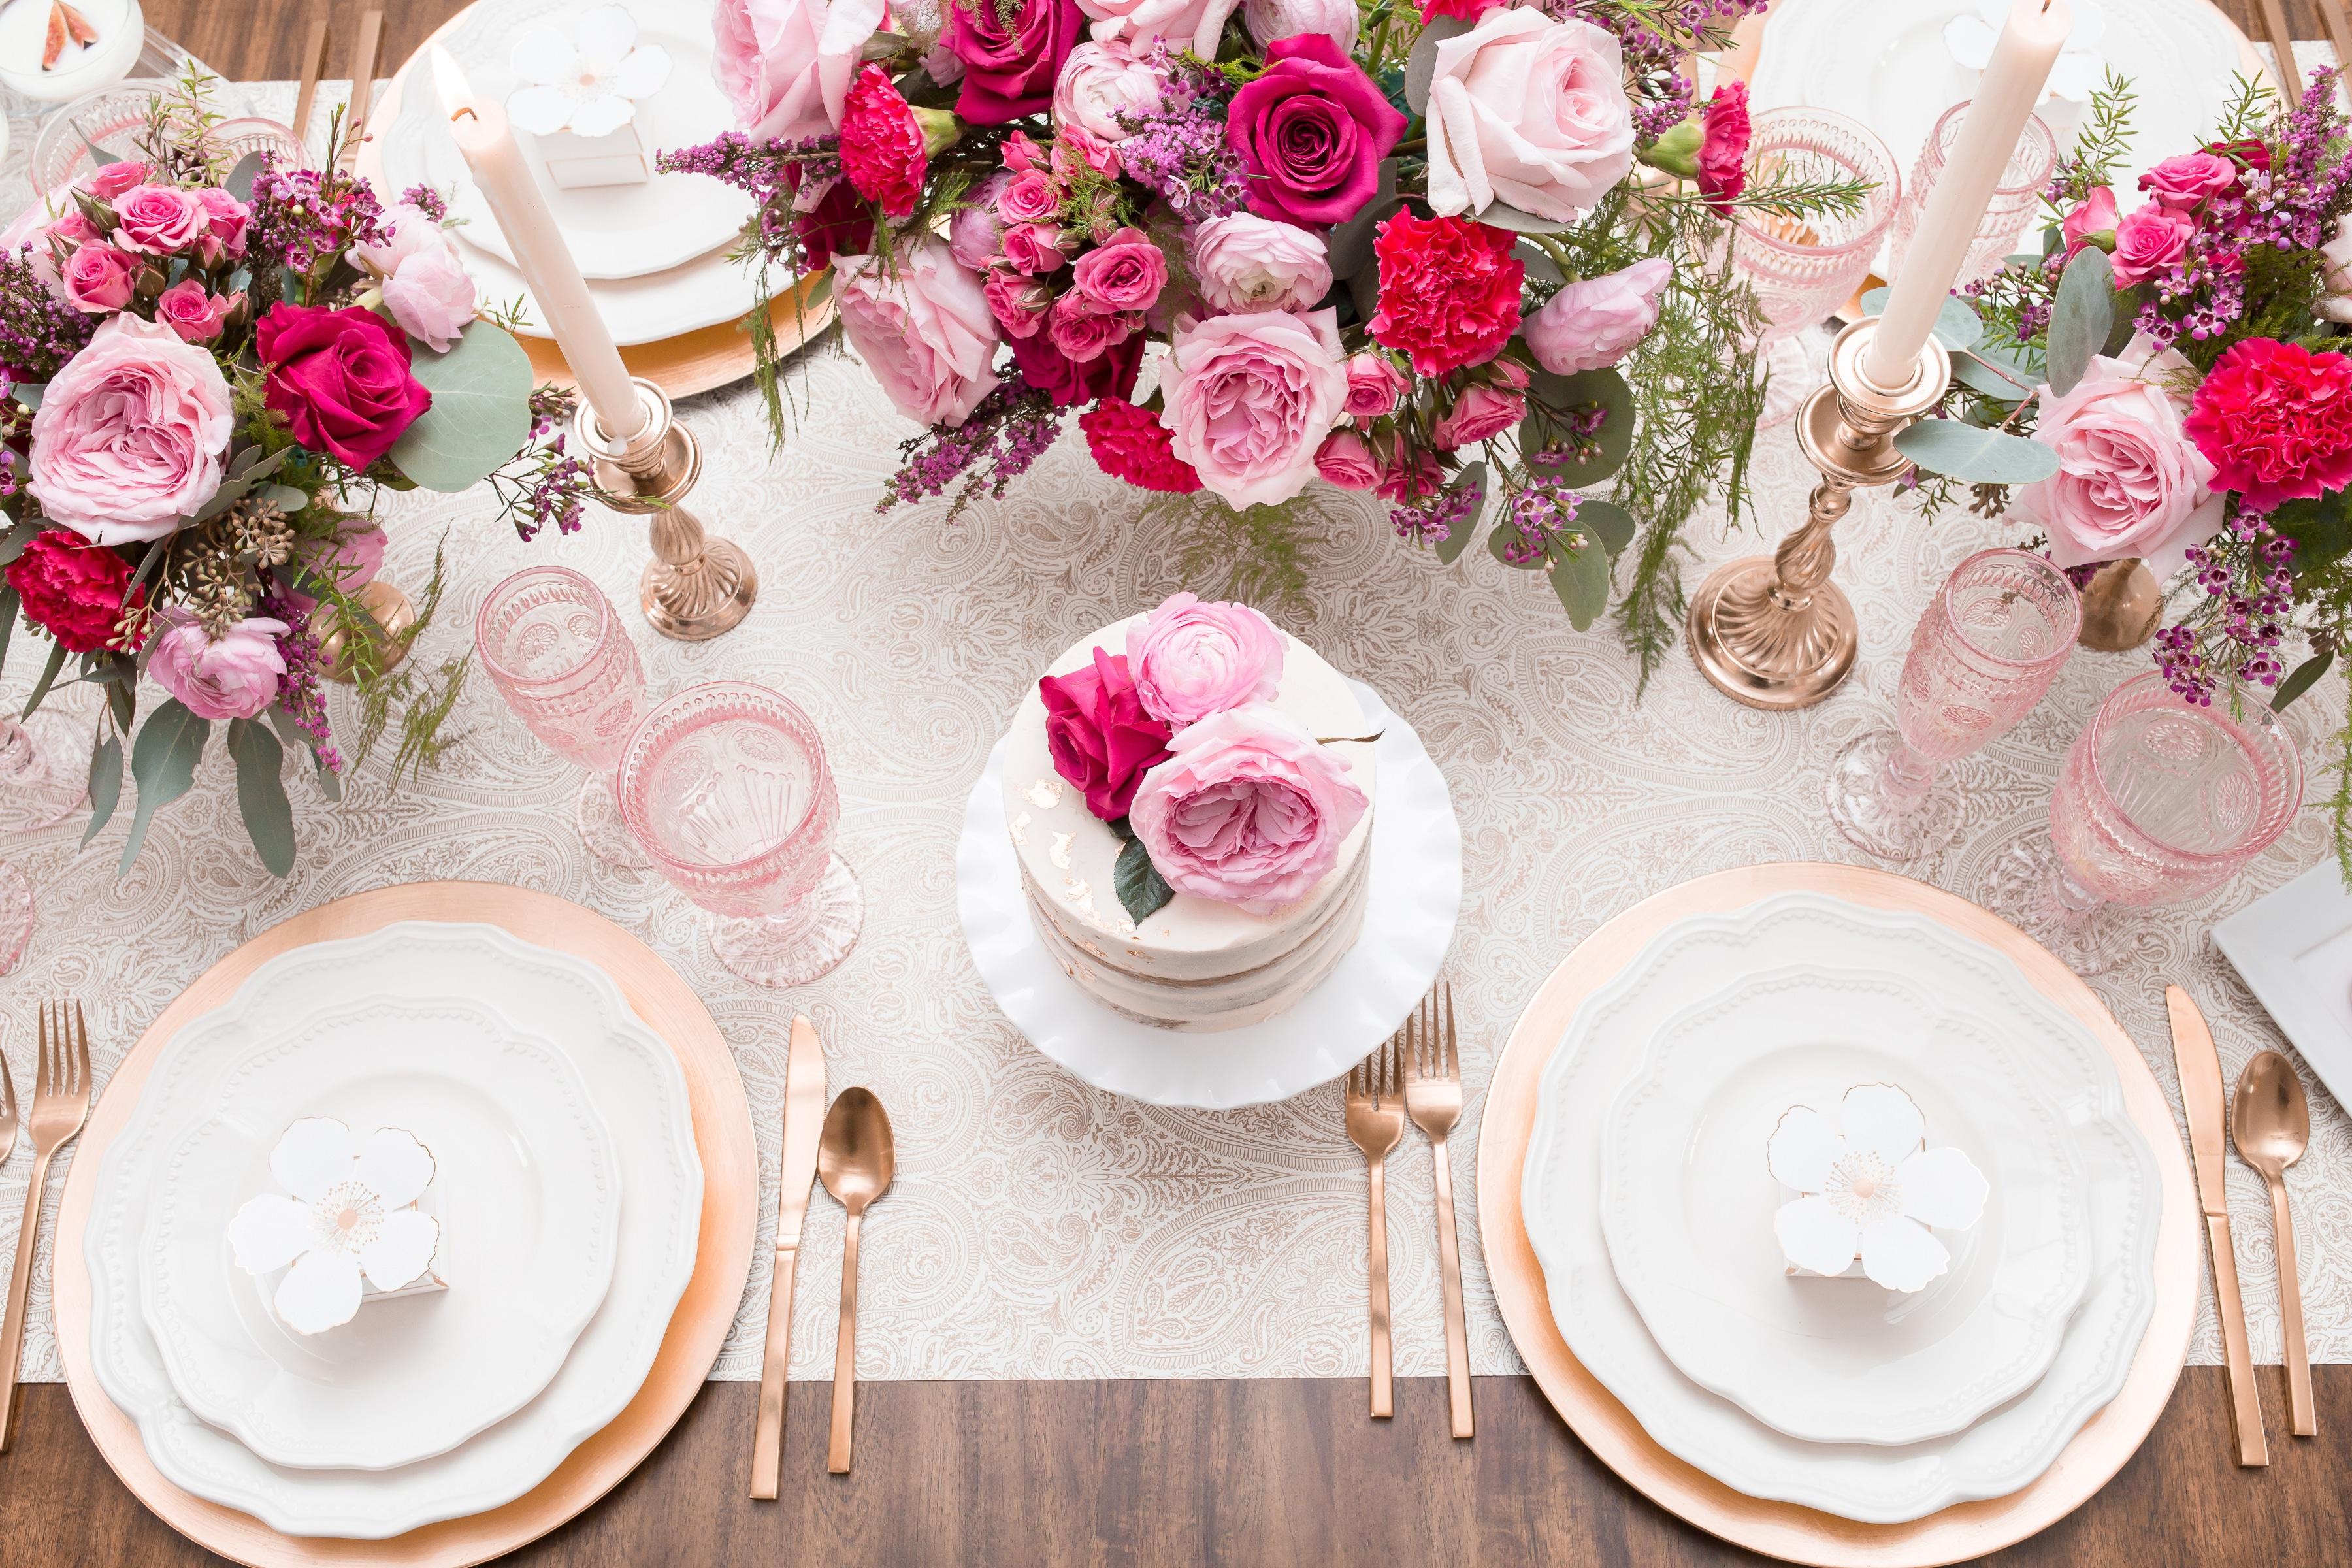 Wedding Planner Salary.Wedding Planners Salary Australia Average Salary And Hourly Rate